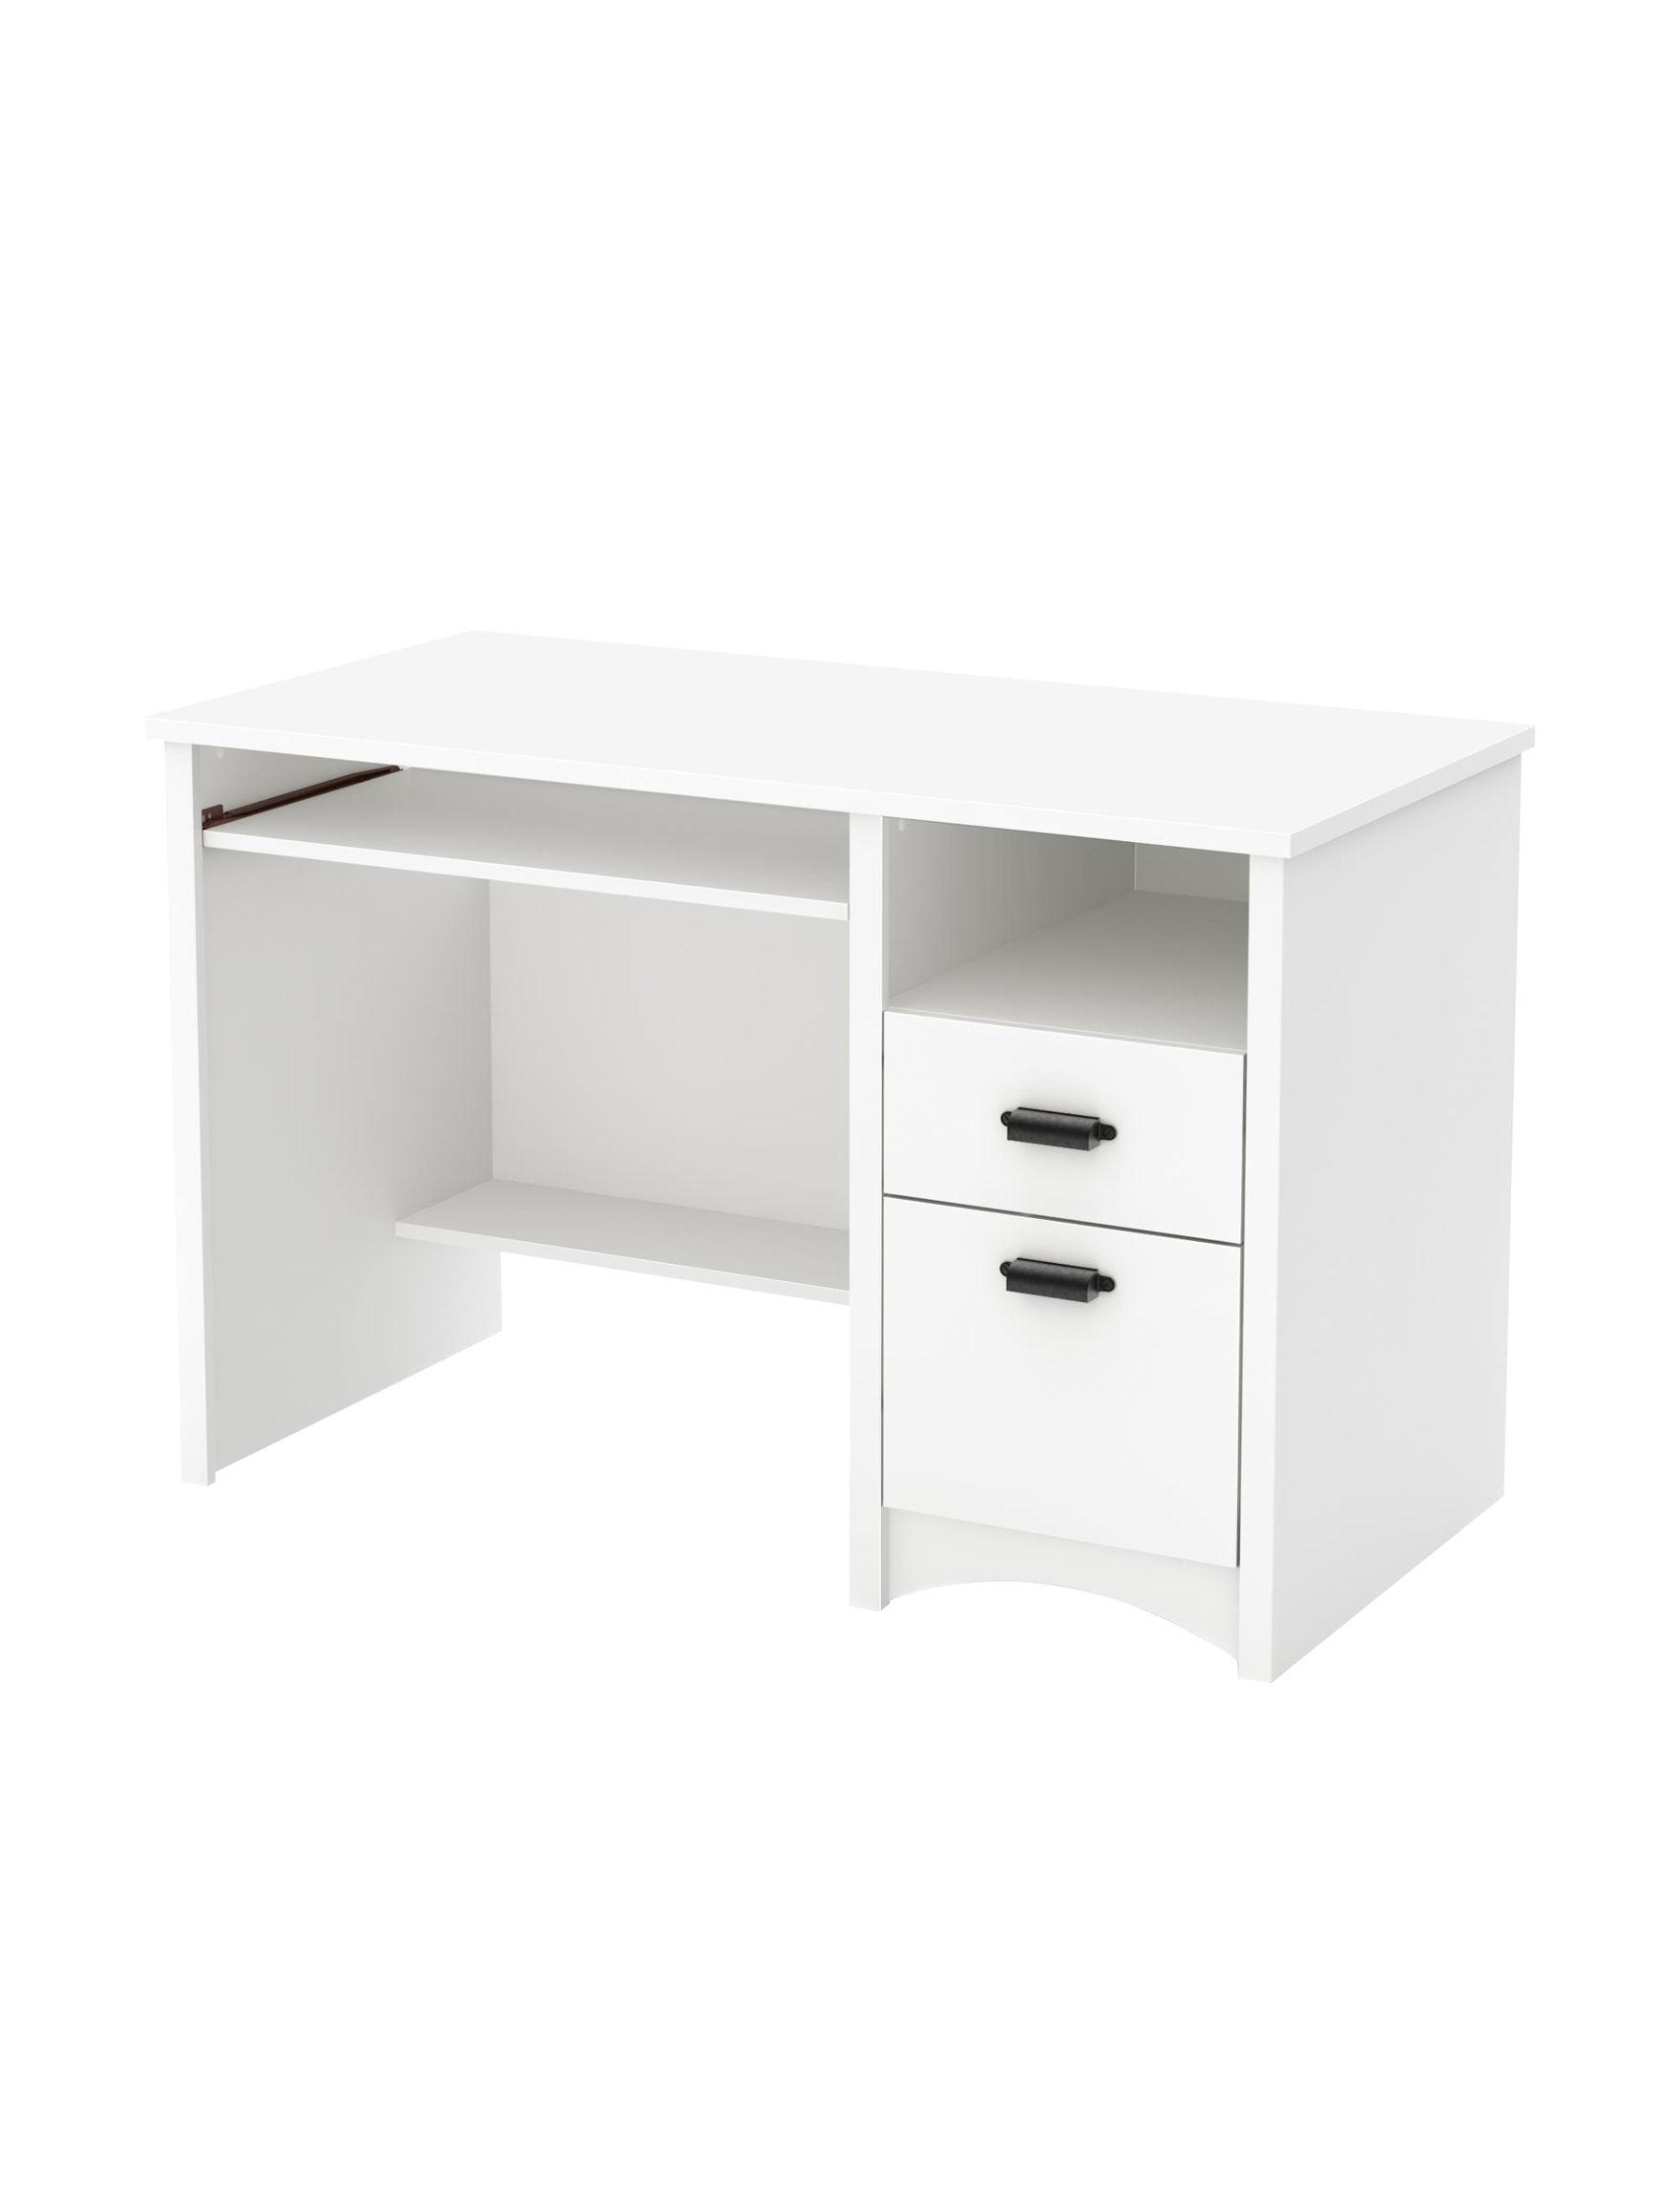 South Shore Pure White Desks Bedroom Furniture Home Office Furniture Living Room Furniture